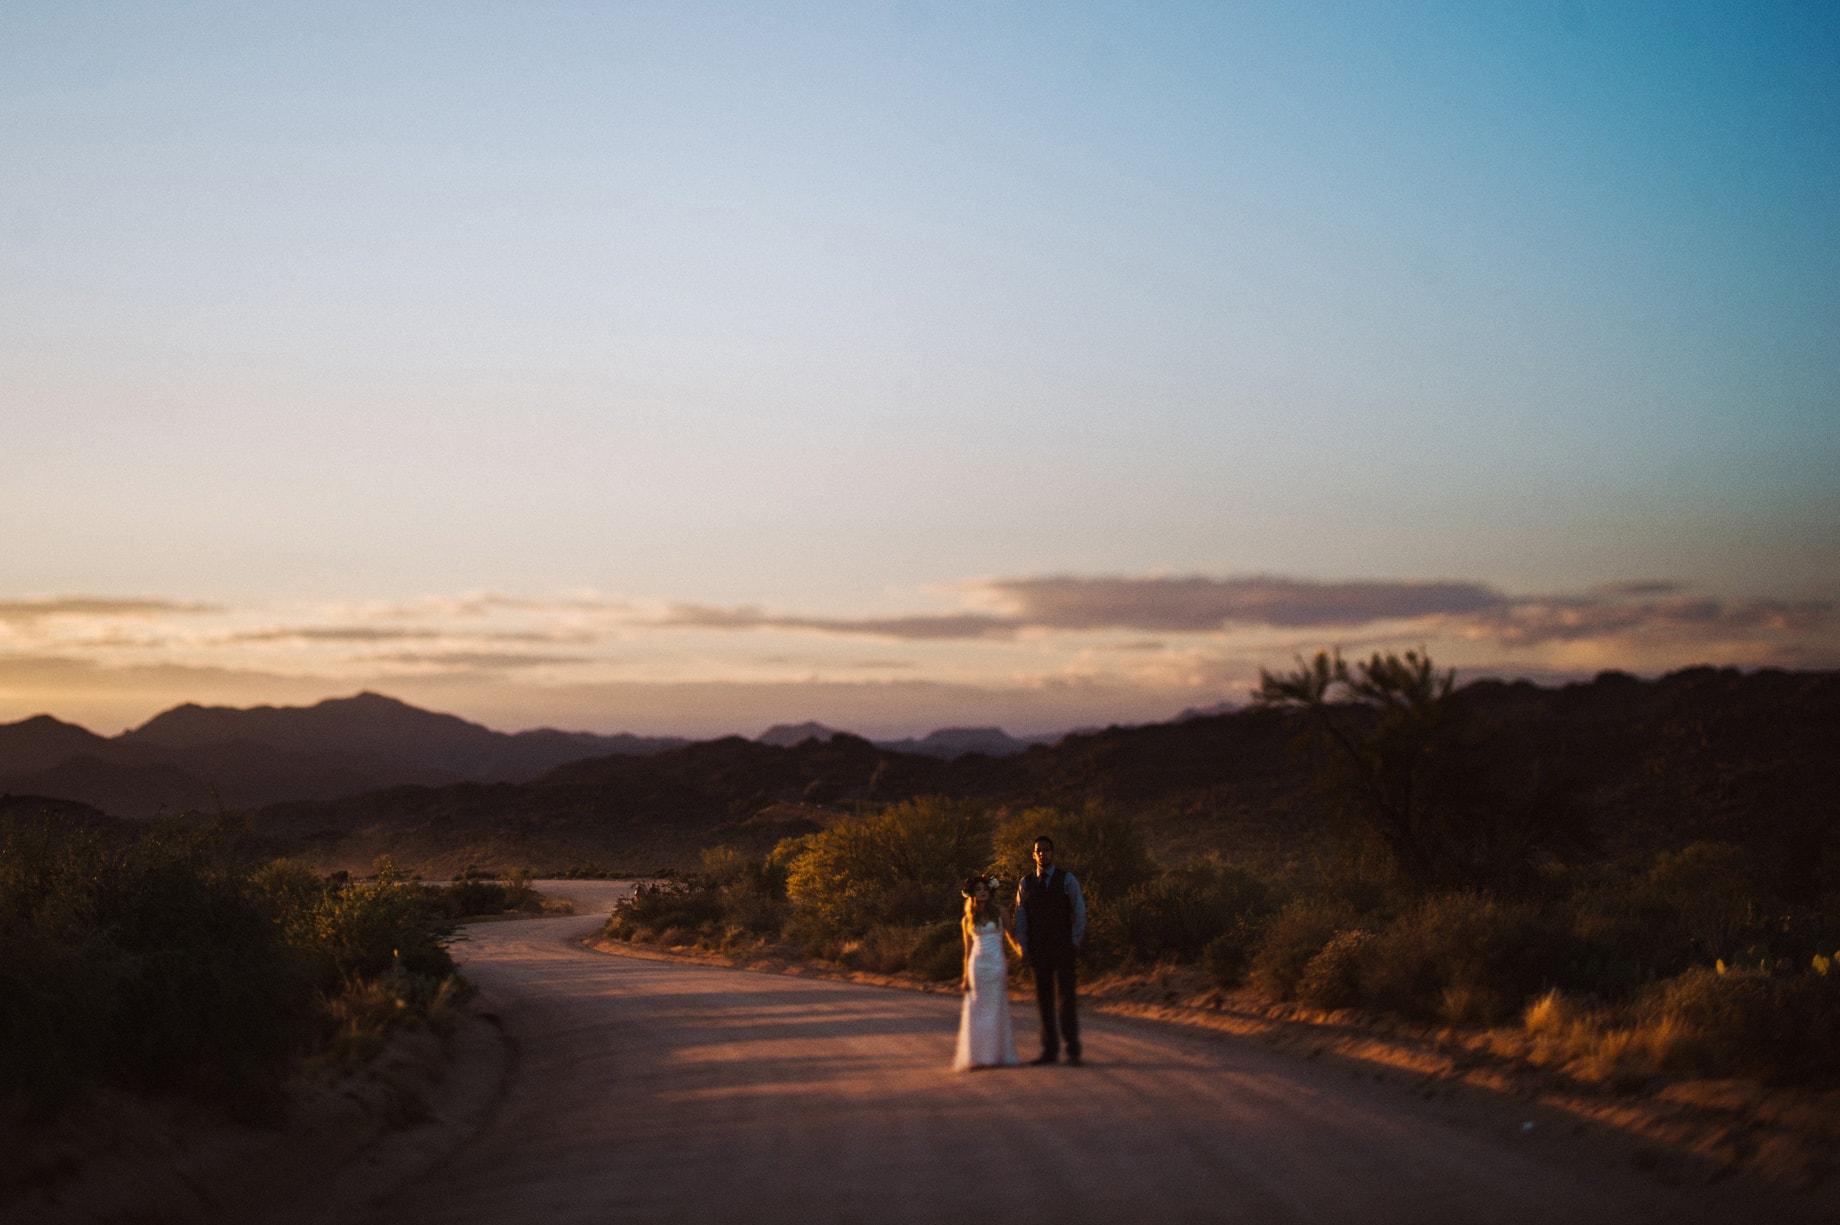 arizona sunset wedding portrait